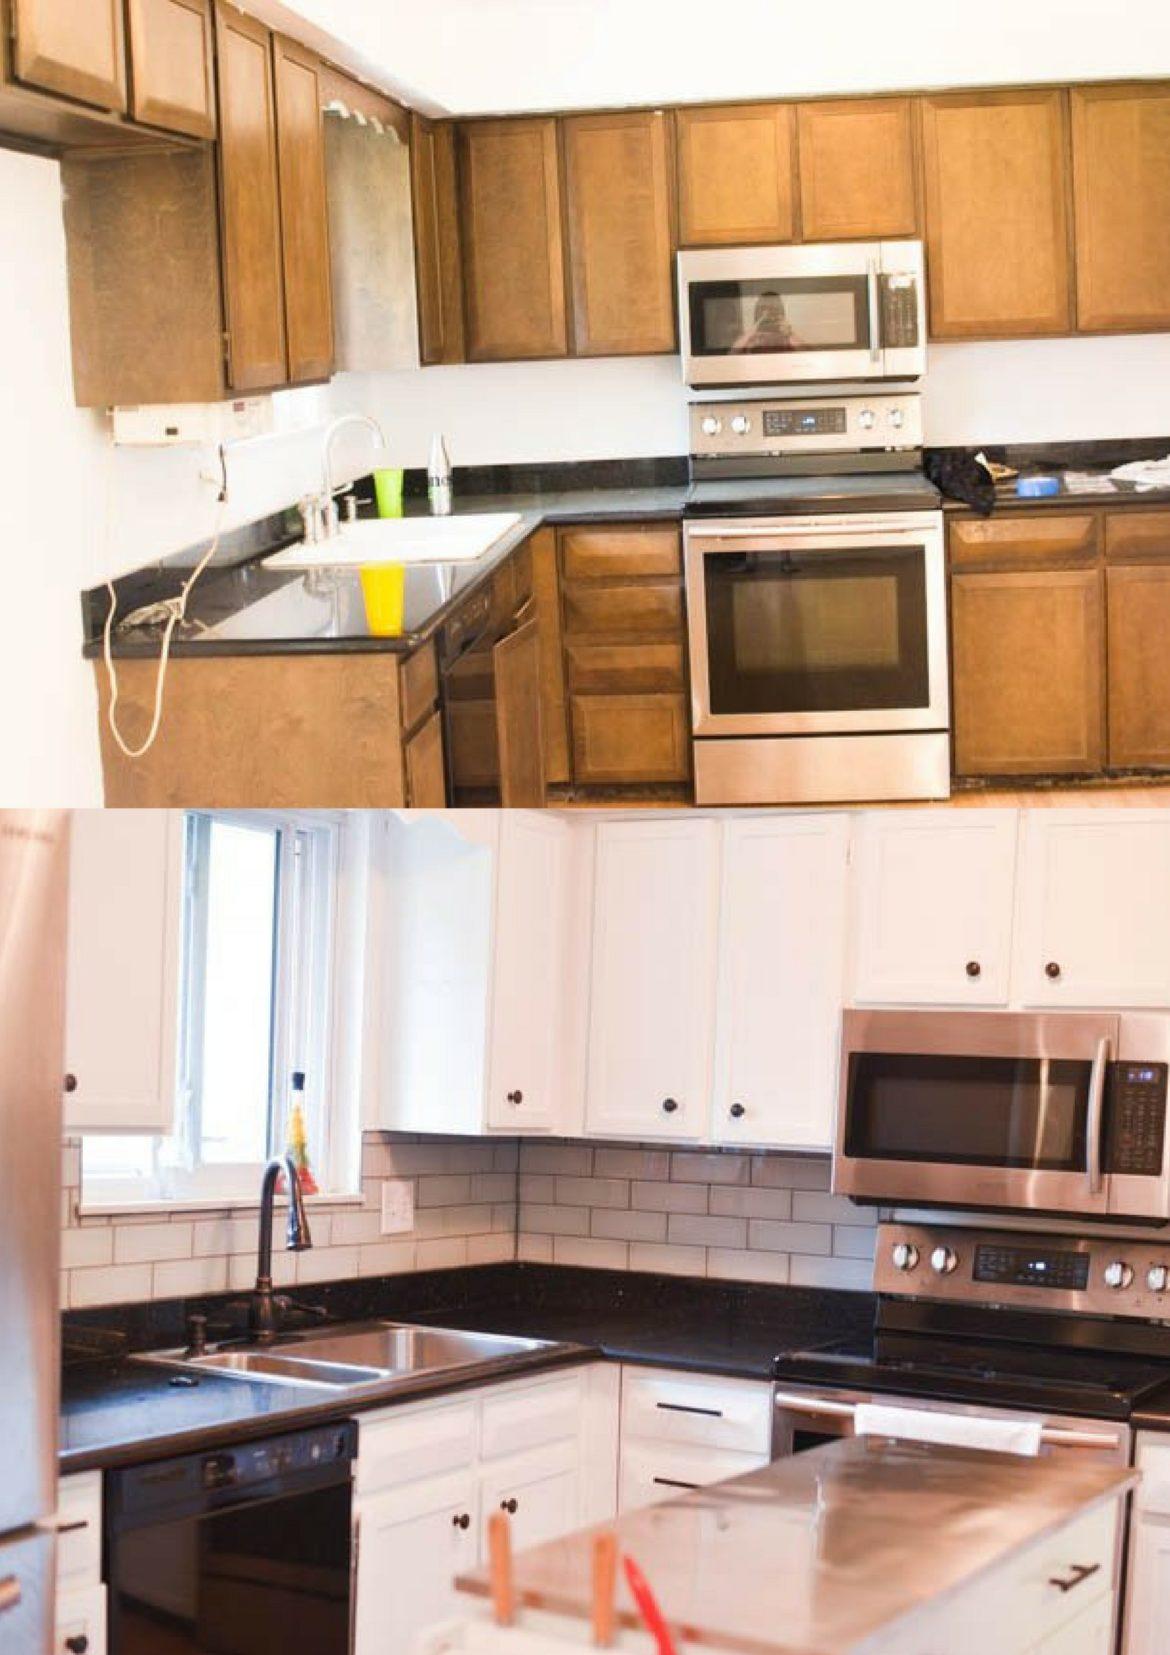 Diy kitchen remodel ideas for Diy kitchens com reviews